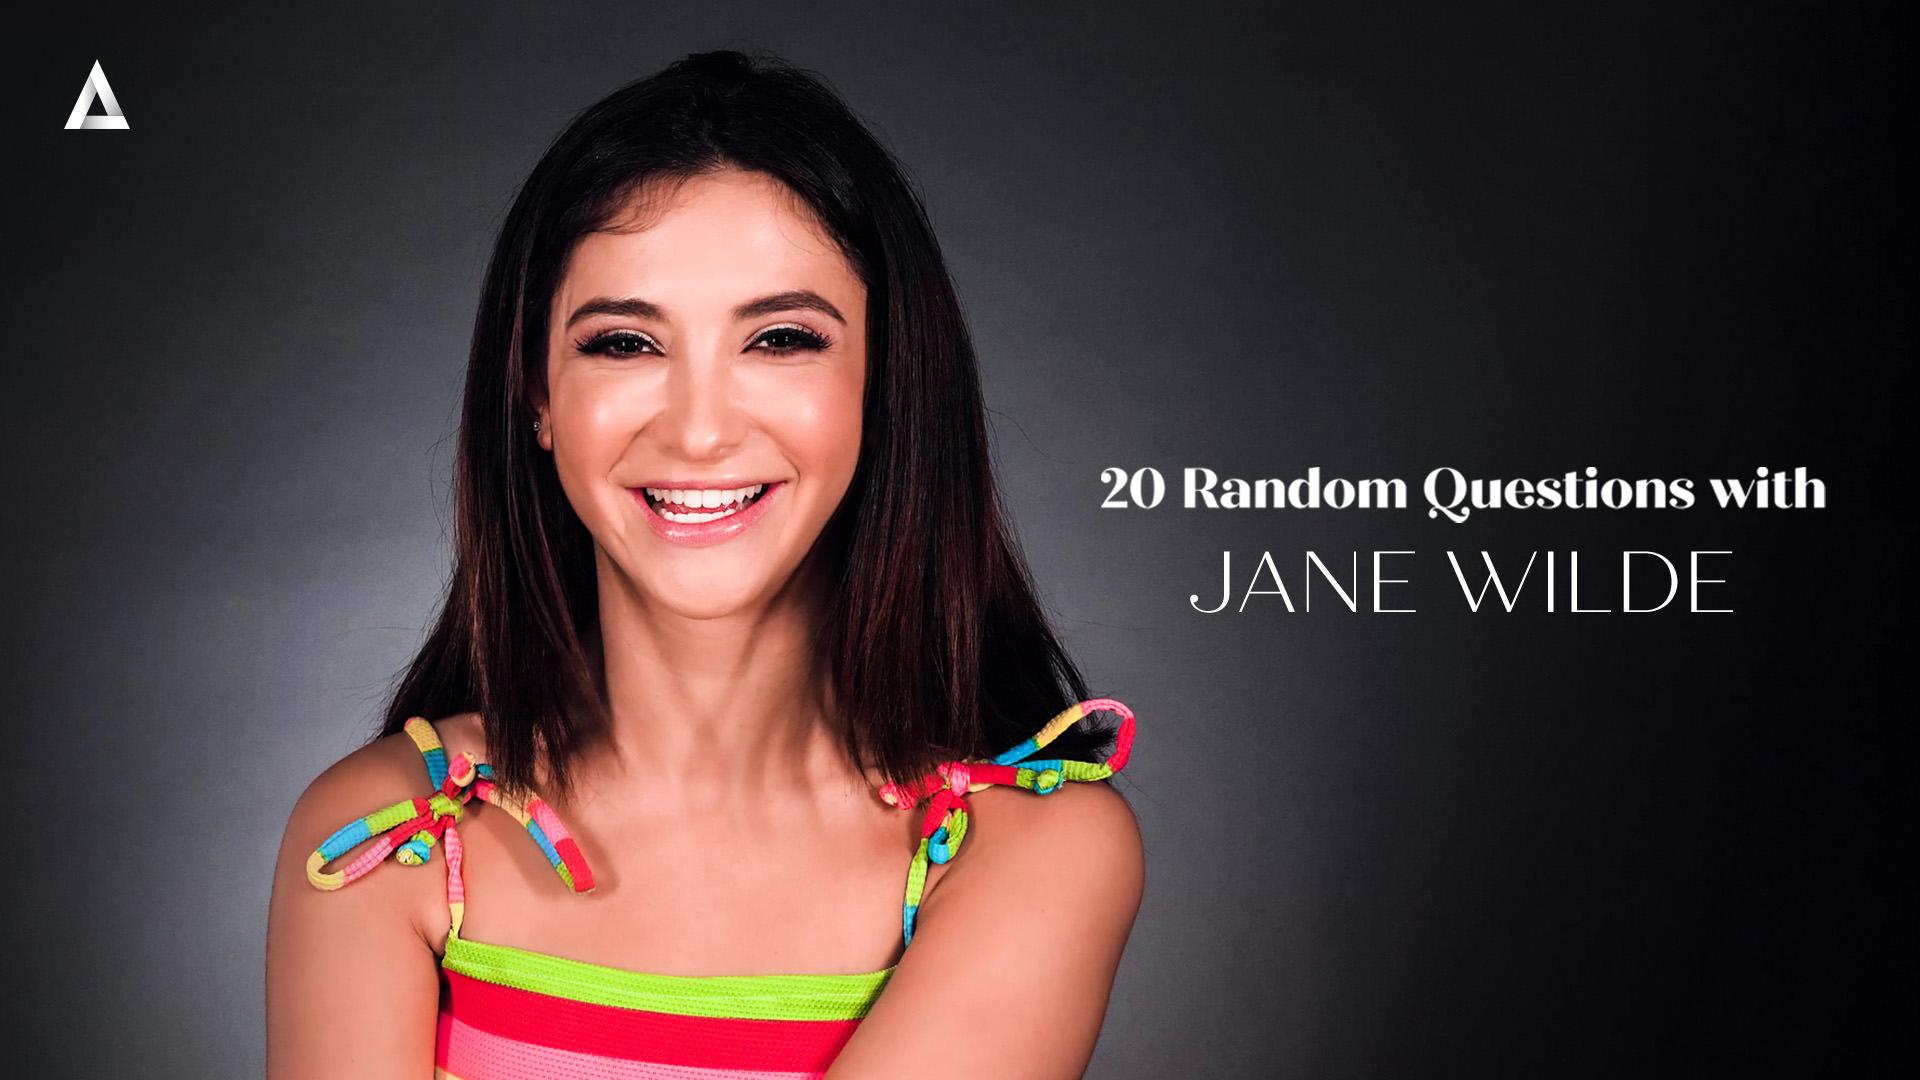 20 Random Questions with Jane Wilde - Jane Wilde 1